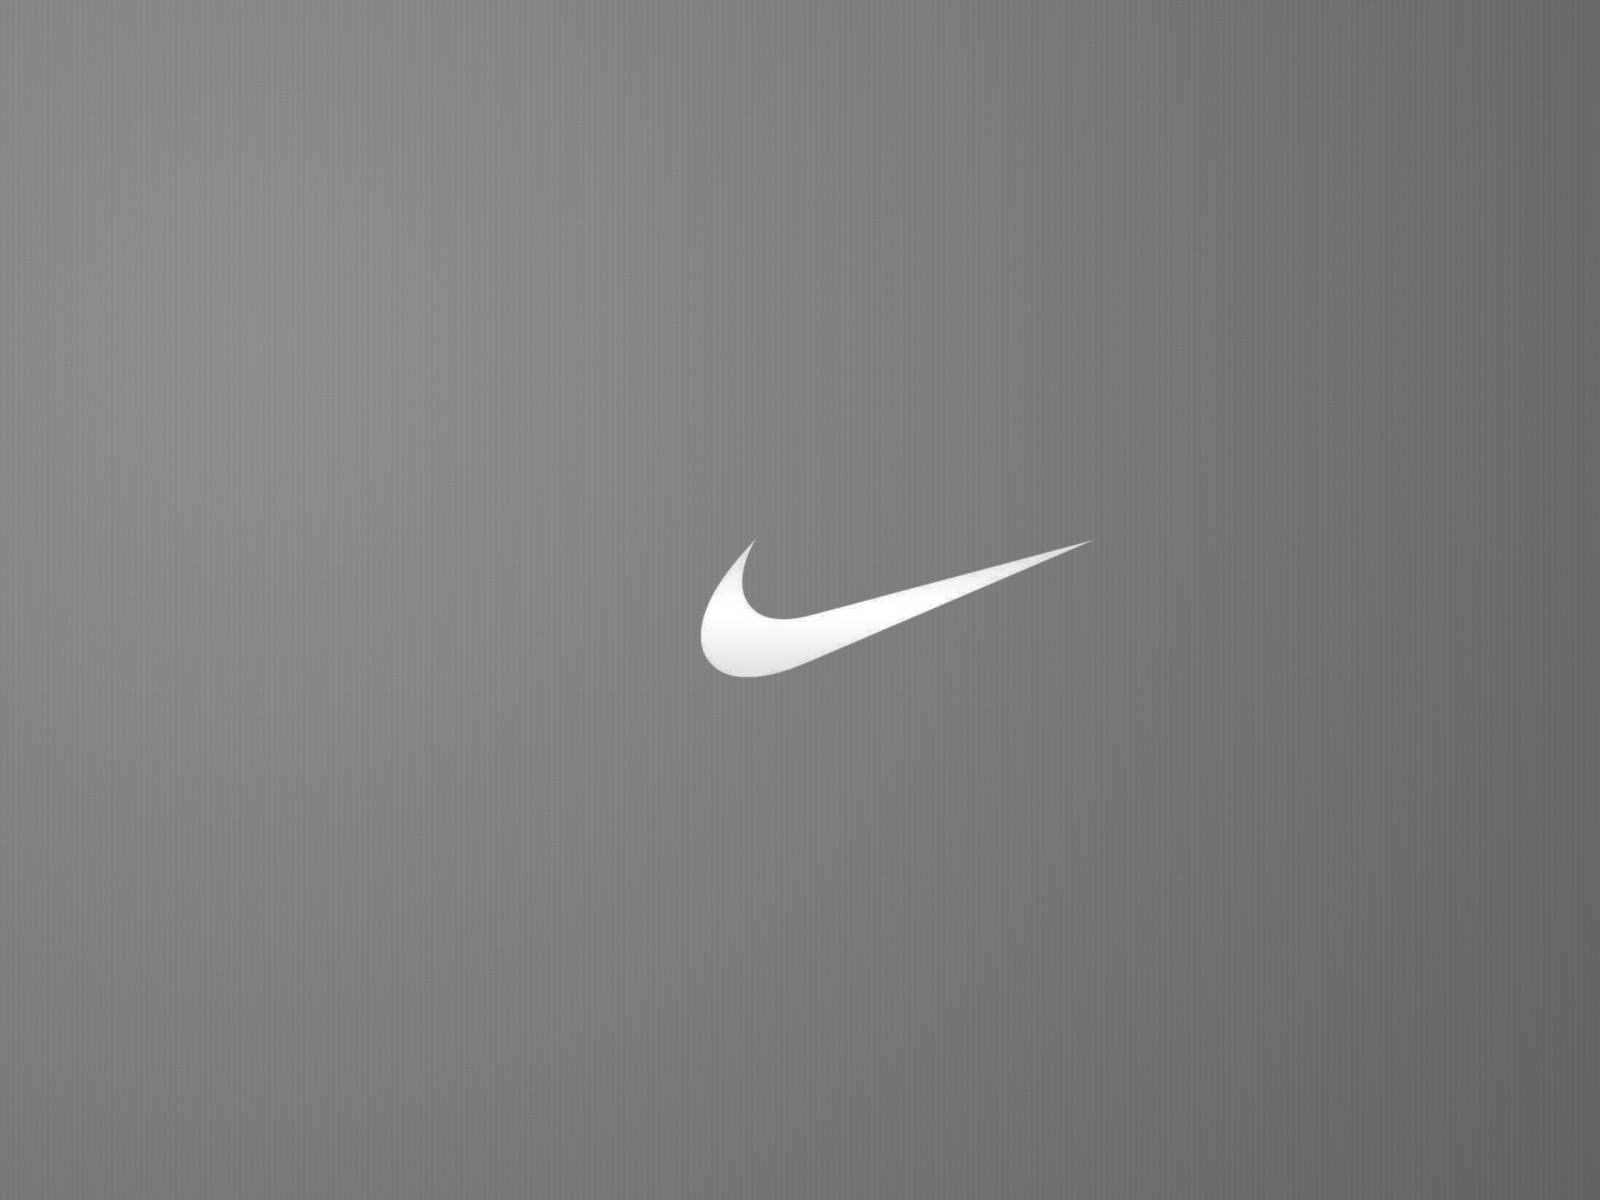 Nike Logo Greyscale Minimal HD Wallpaper